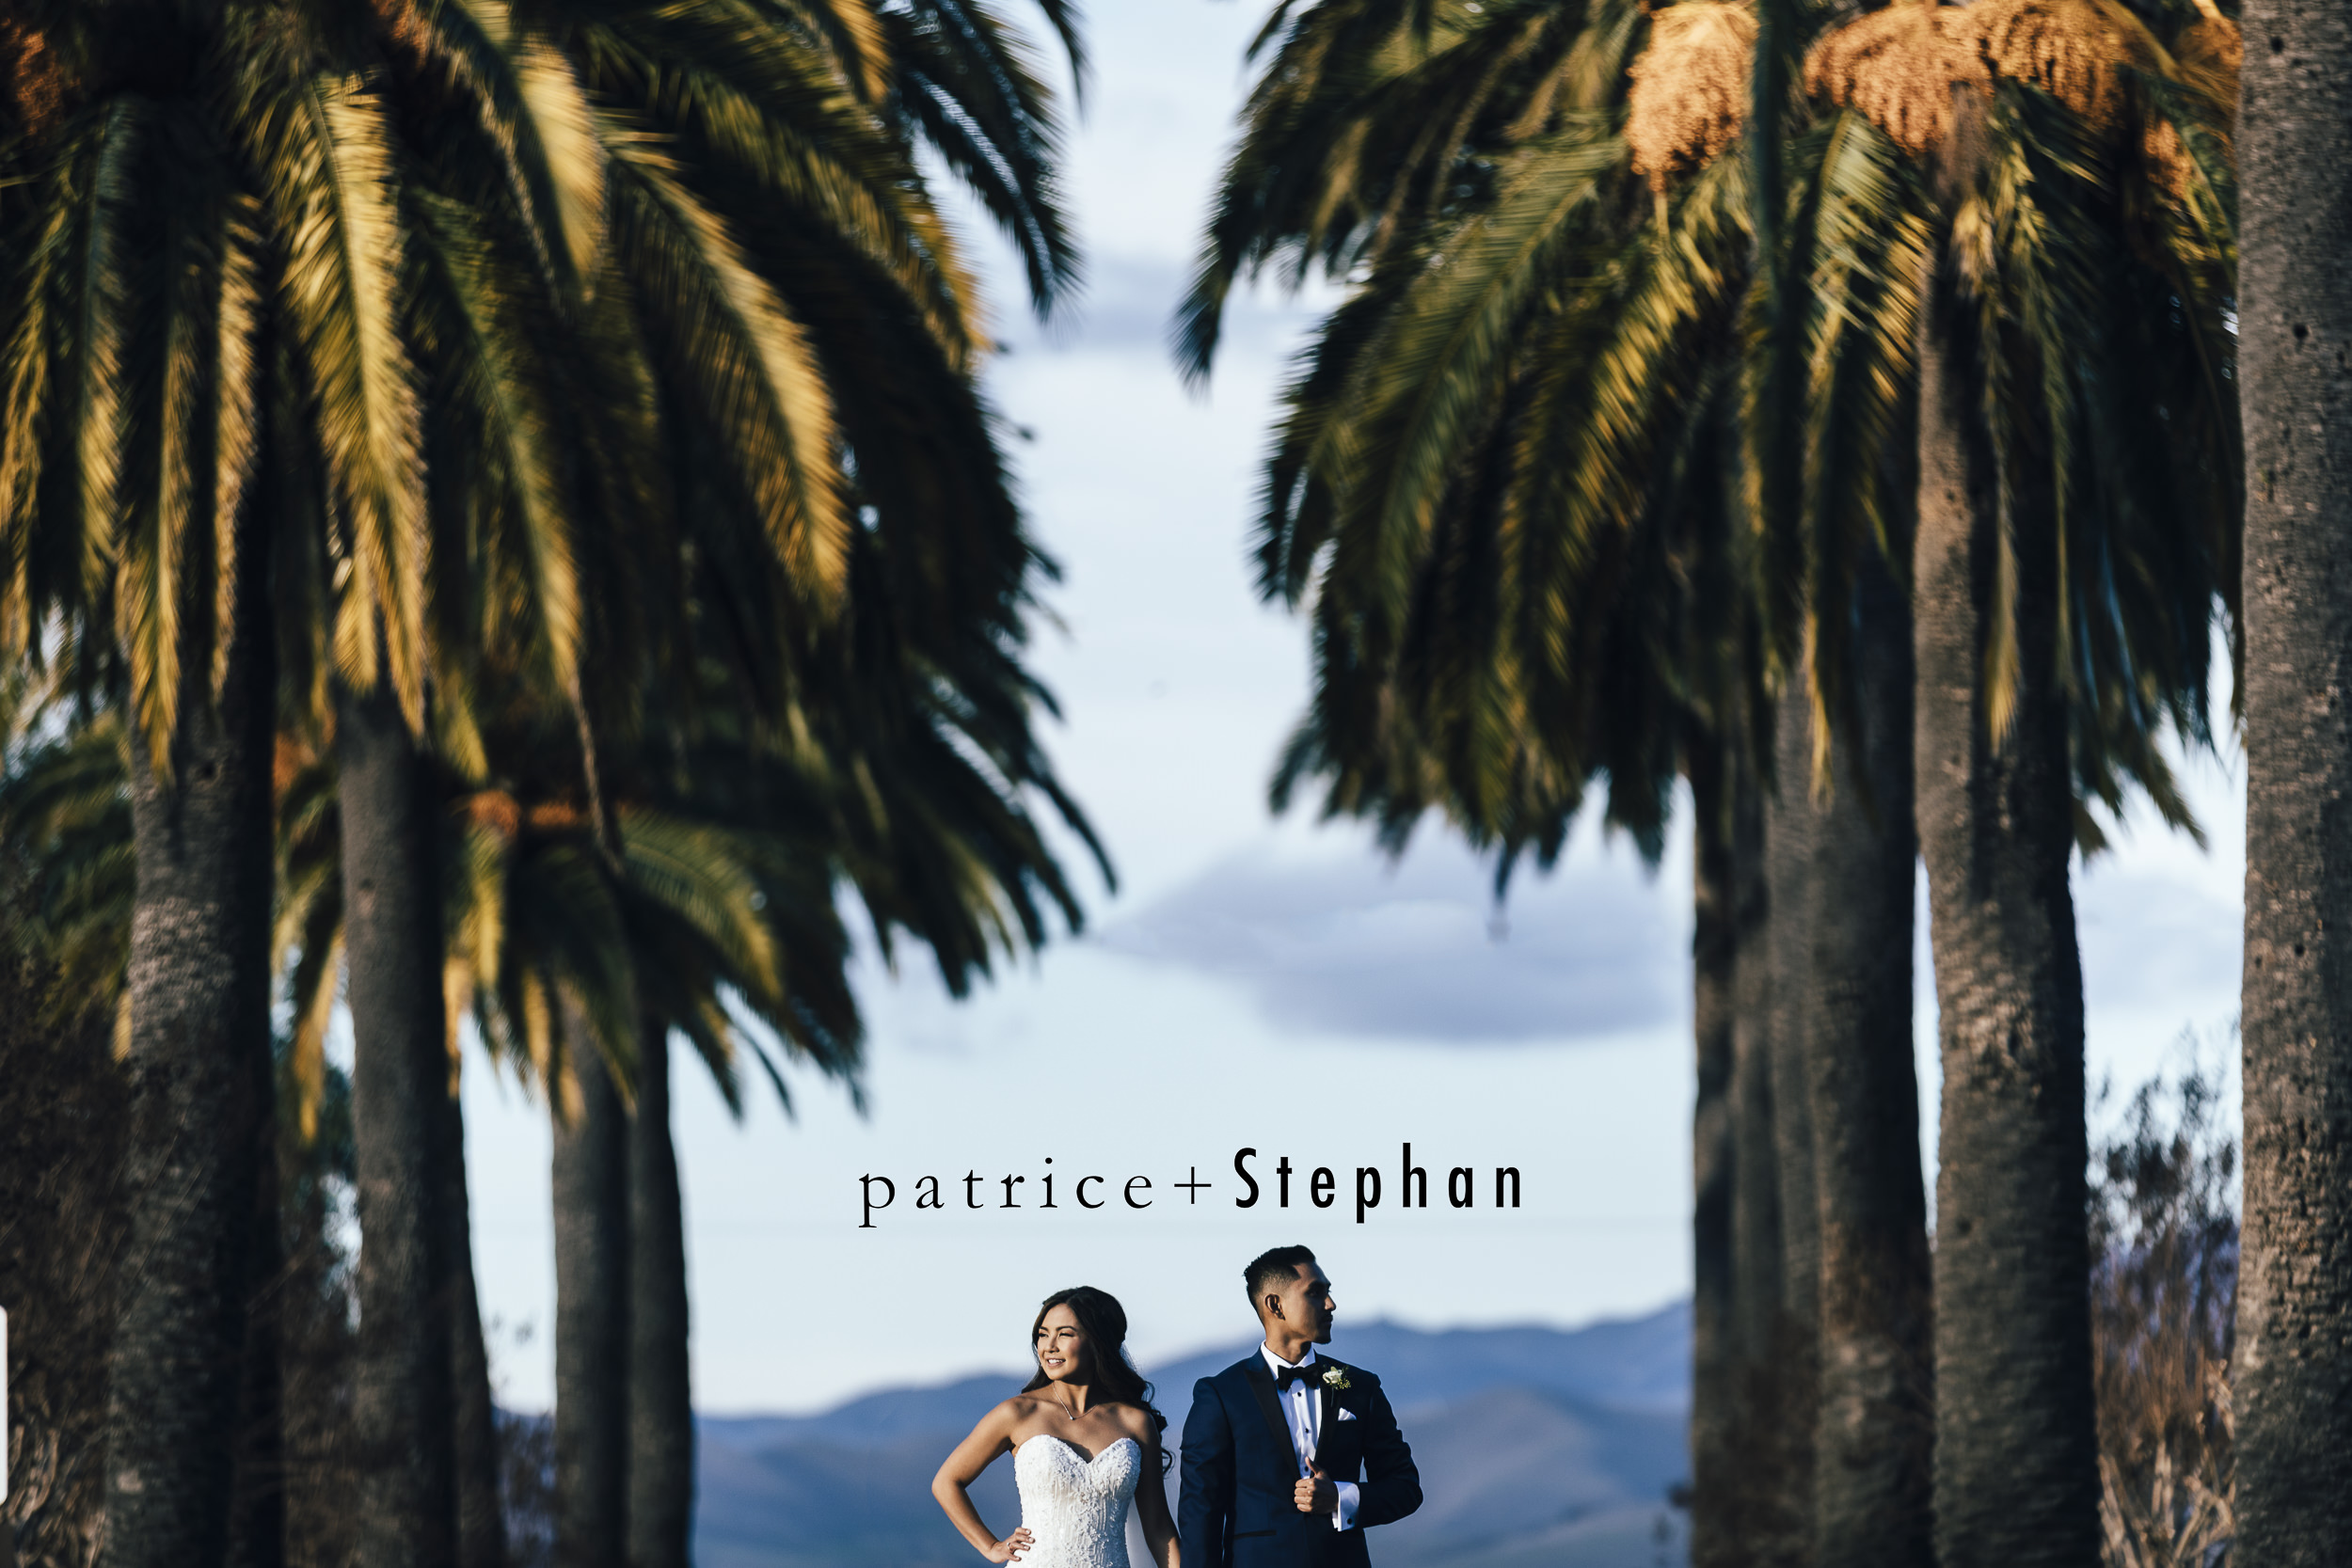 20180119-PalmEventCenterWedding-Reception-FlaresBridal-PatriceStephen-001.jpg